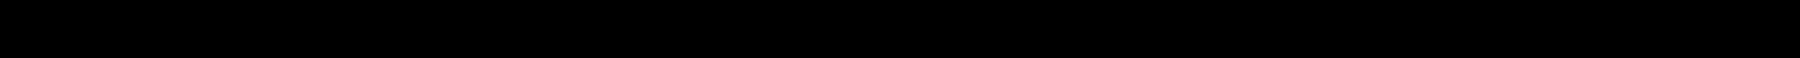 beaglebone_blob